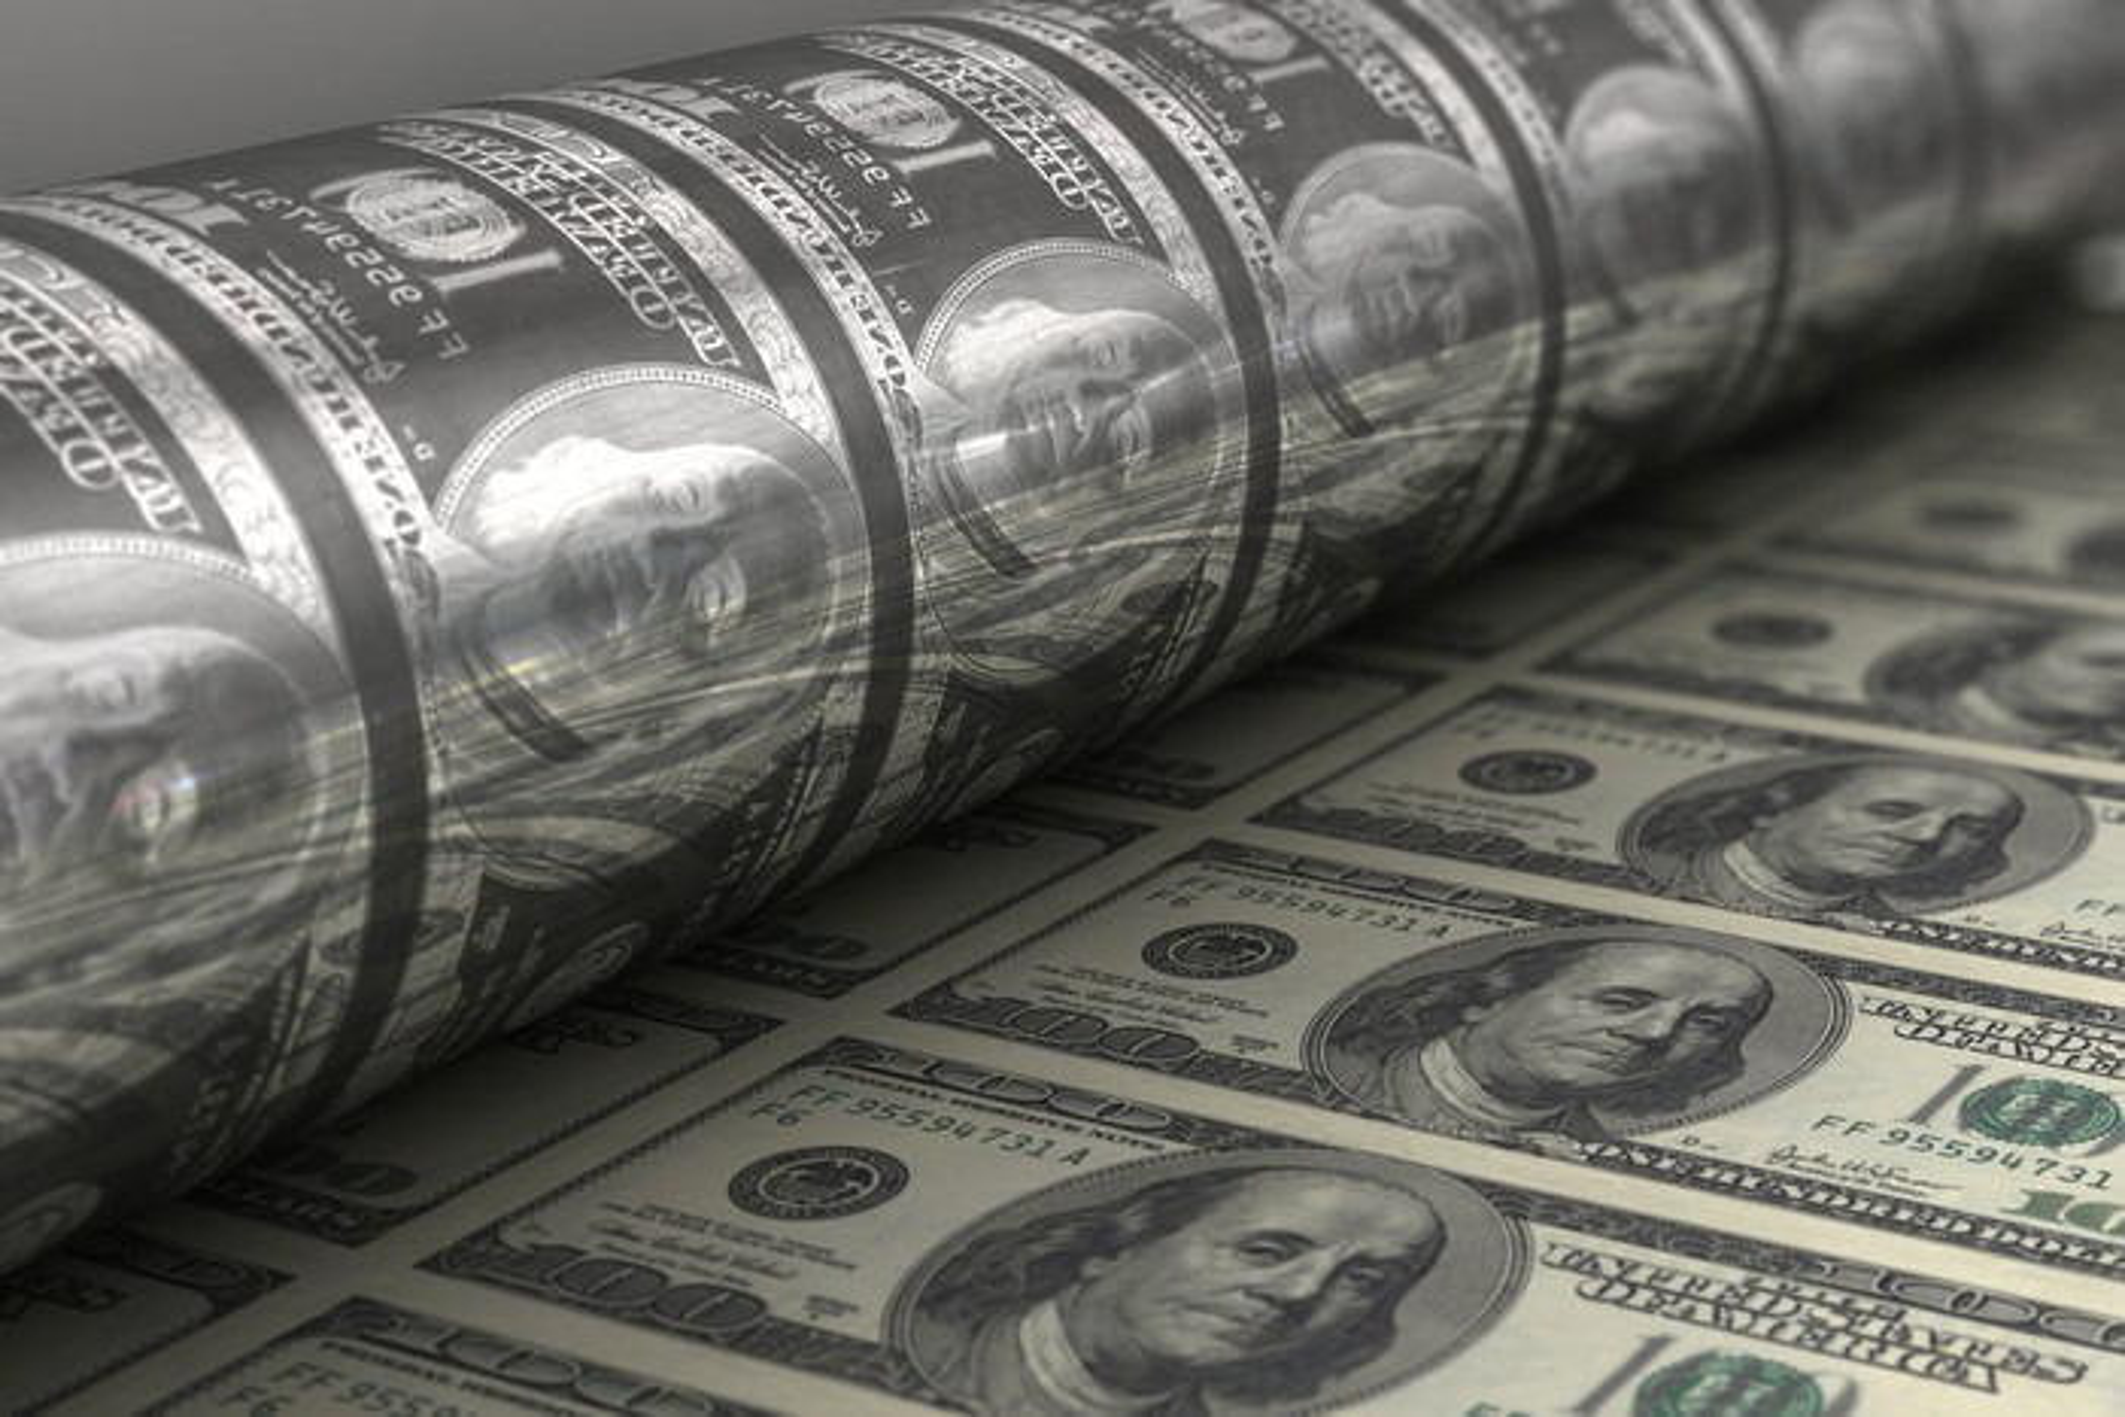 A printing press printing off hundred dollar bills.